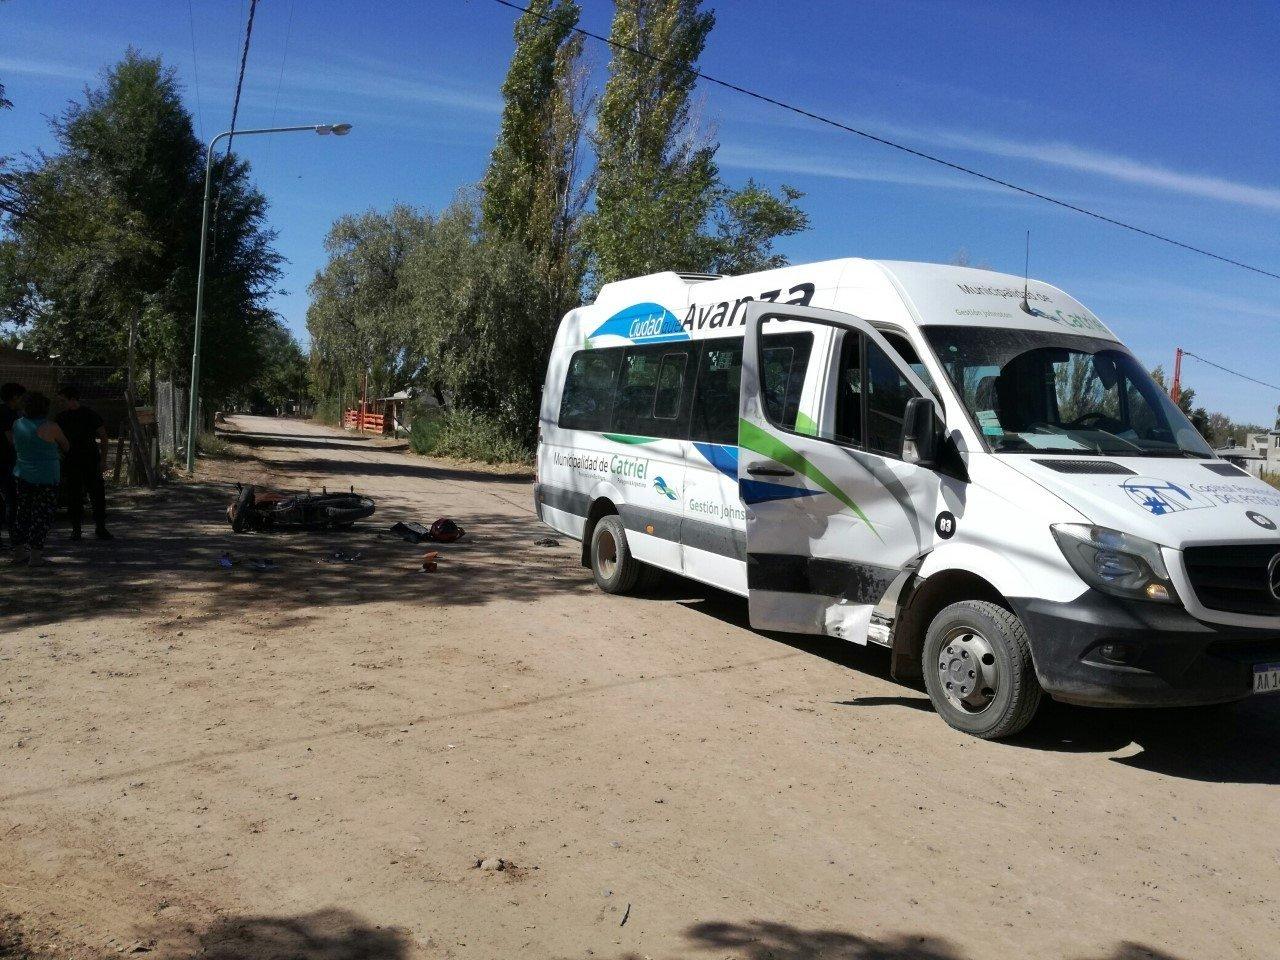 Catriel25Noticias.com ac-muni-484x363 Accidente de tránsito. Moto chocó a un transporte municipal. Un herido leve Destacadas LOCALES